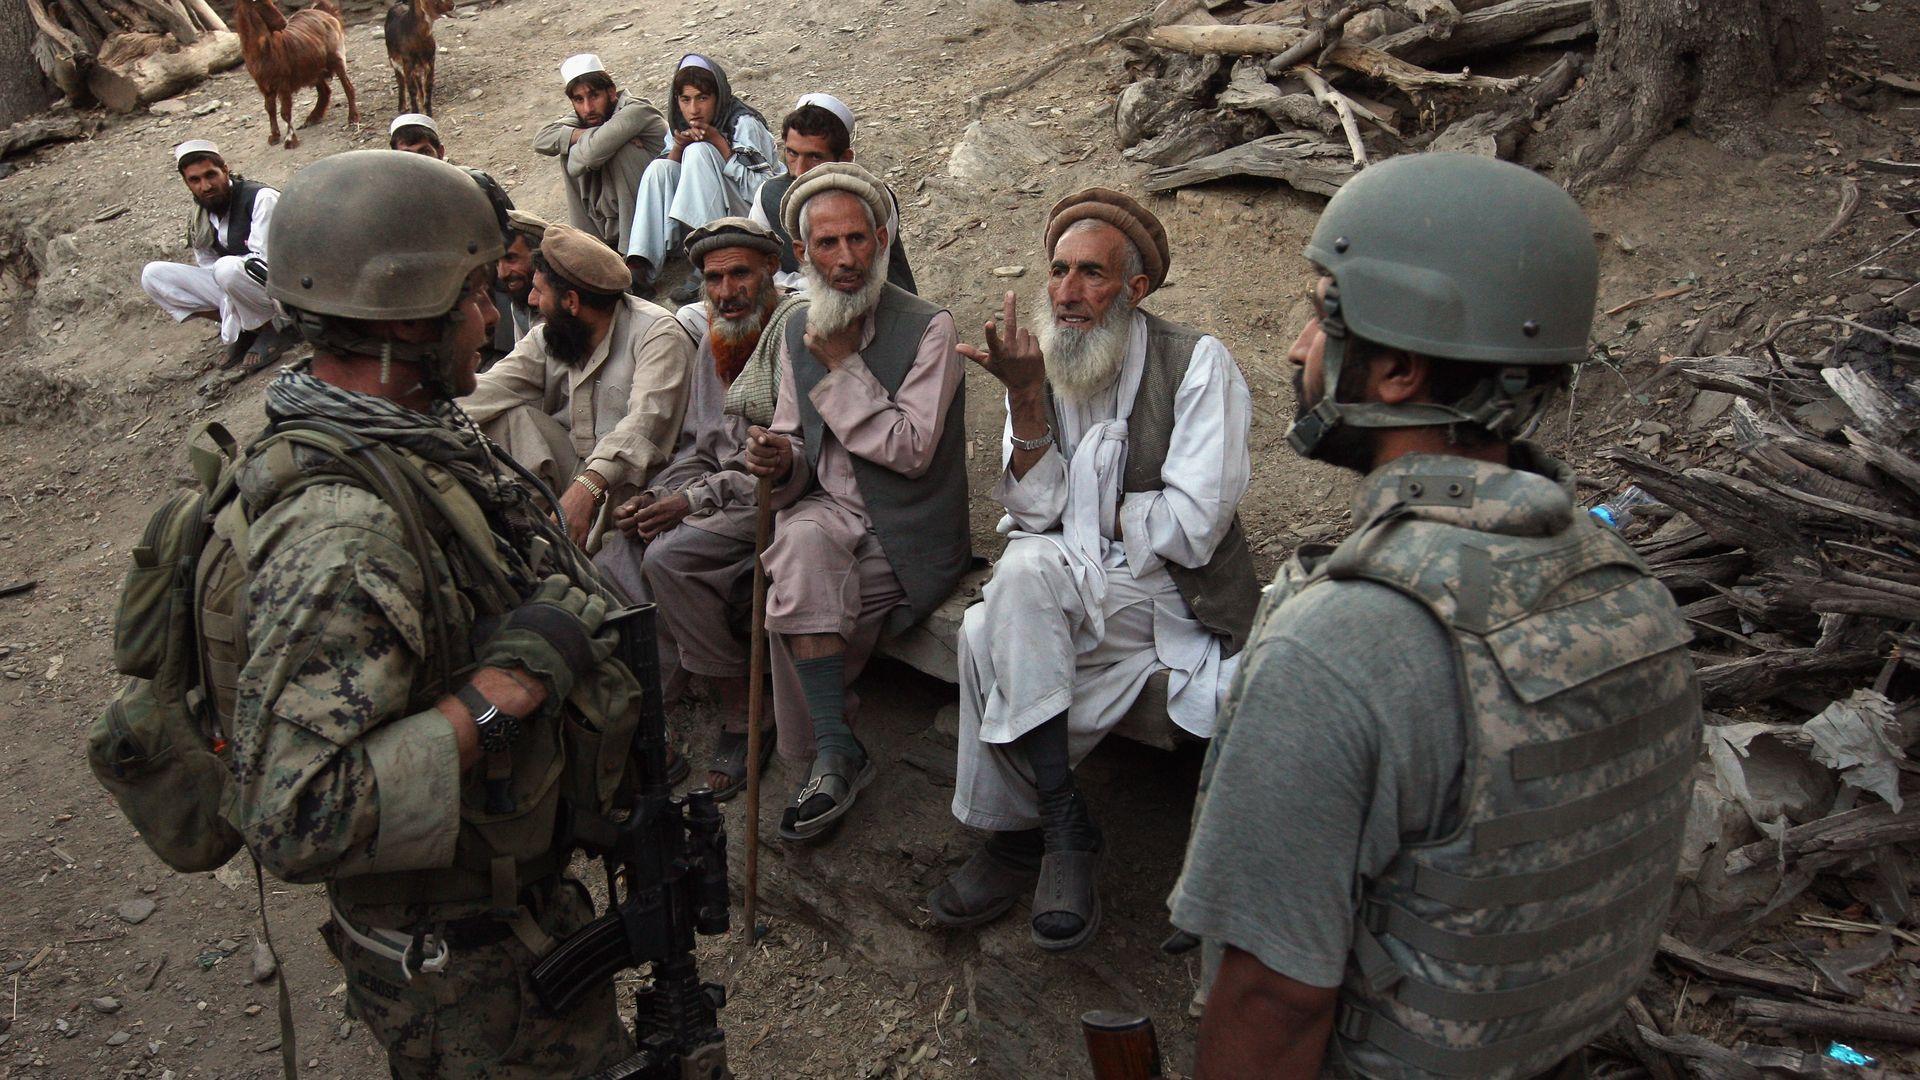 U.S. to evacuate some Afghans who helped troops before withdrawal - Axios